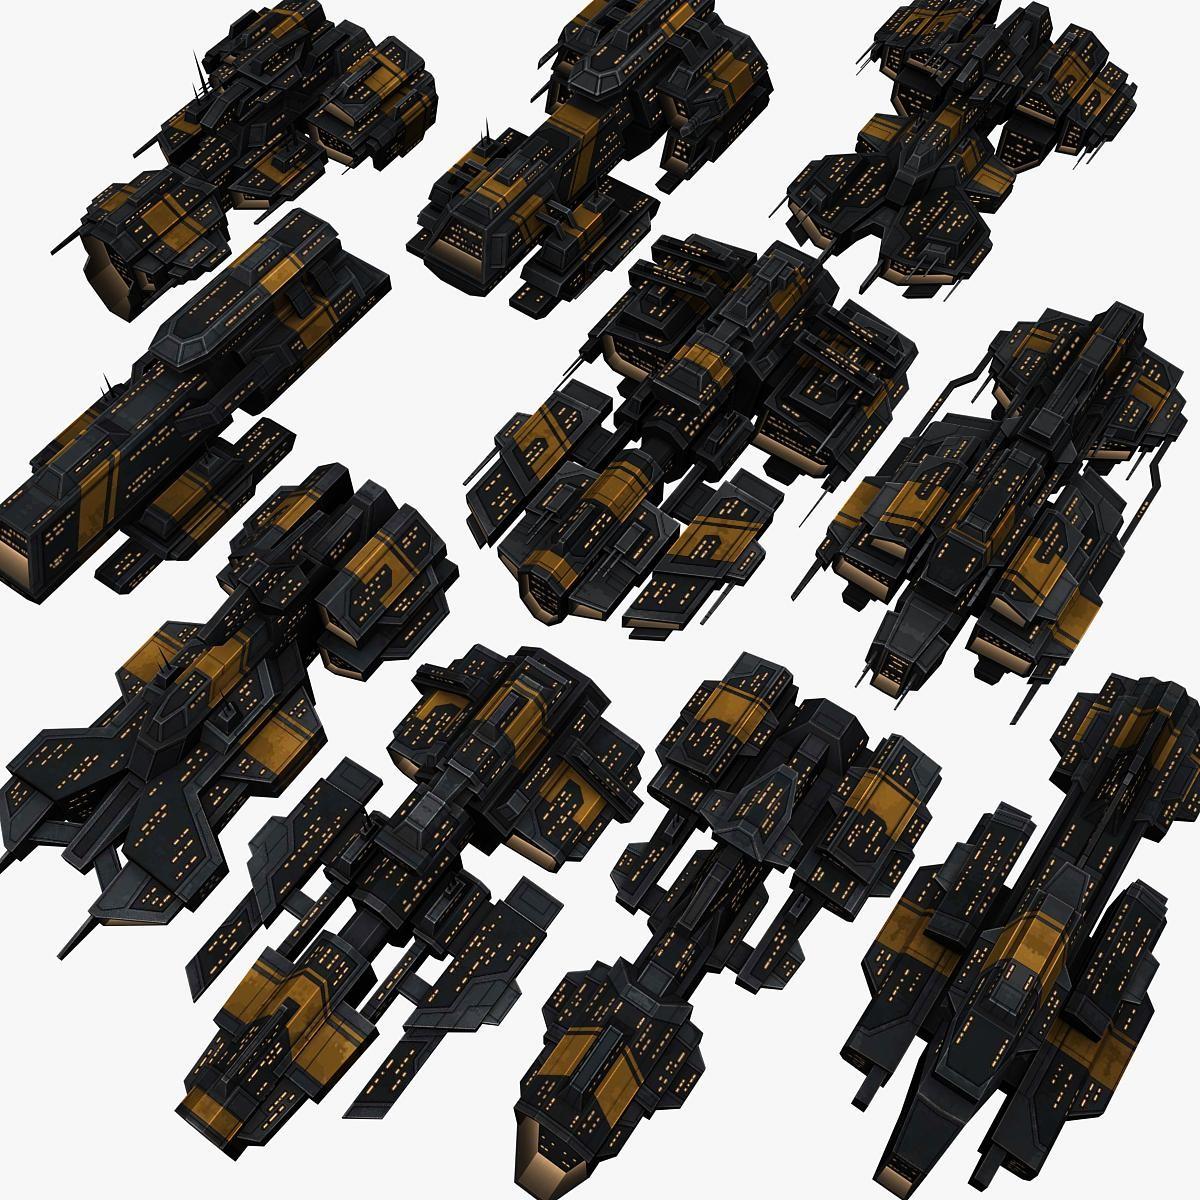 10_space_battleships_preview_0.jpg